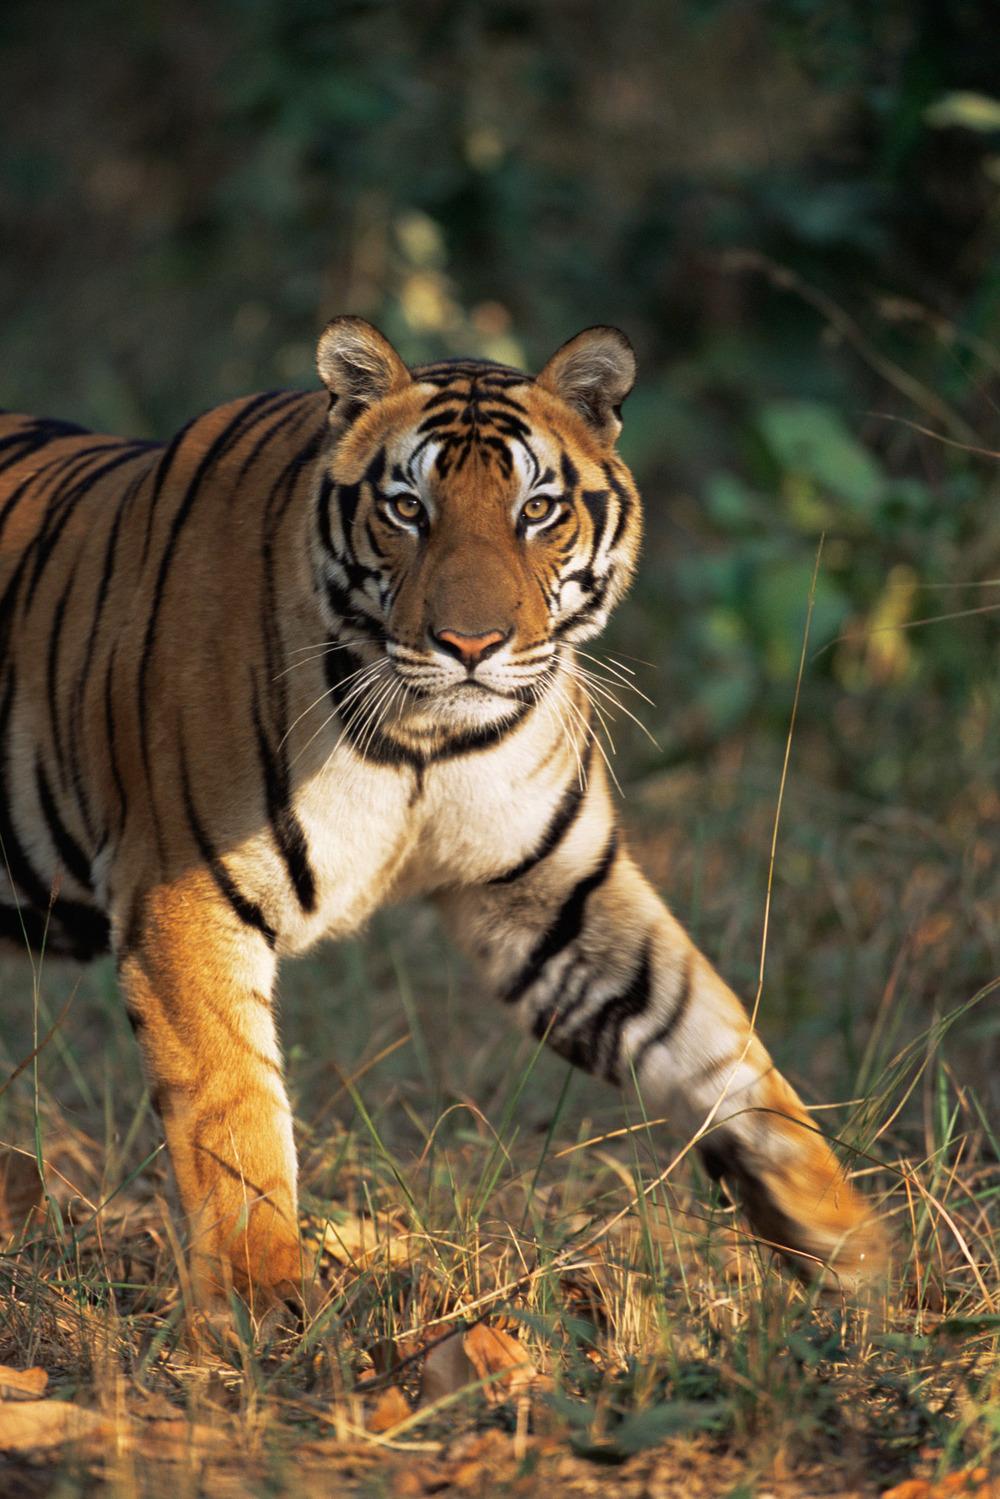 Bengal tiger portrait, Kanha National Park, Madhya Pradesh, India